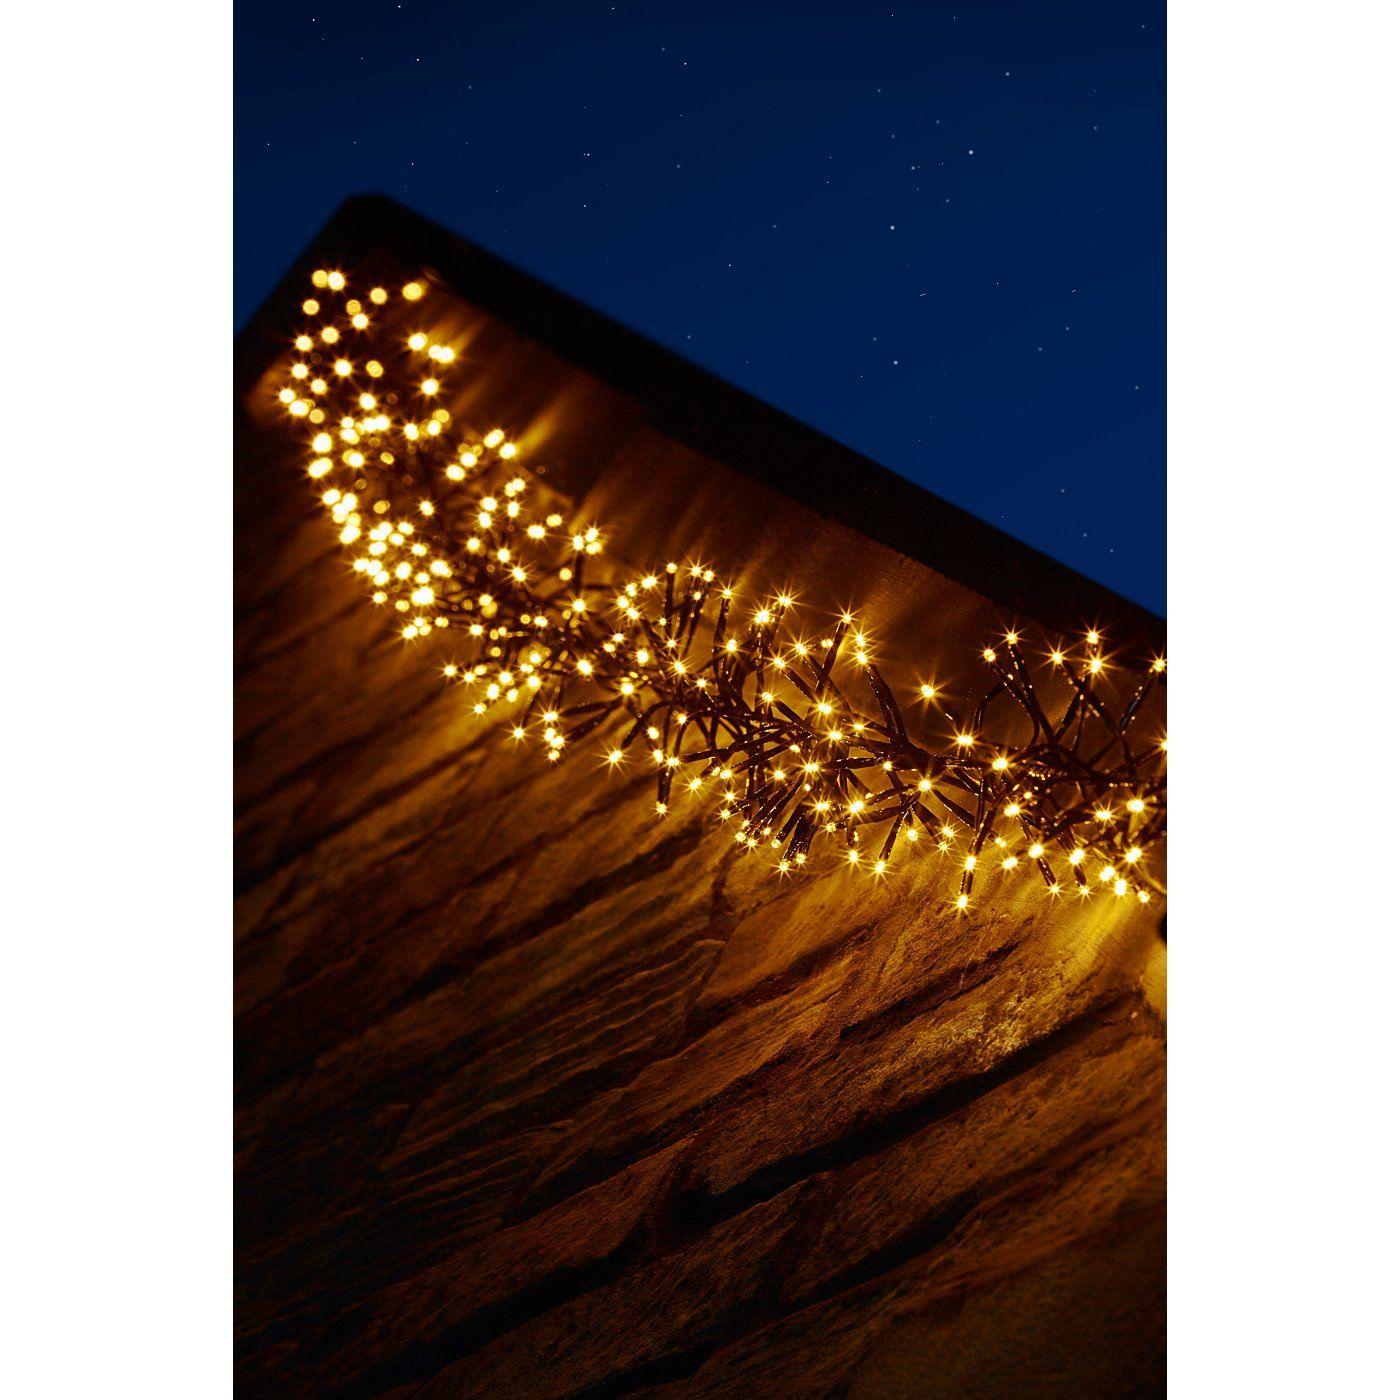 Cluster Lights Tree Decorations ASDA direct Cluster